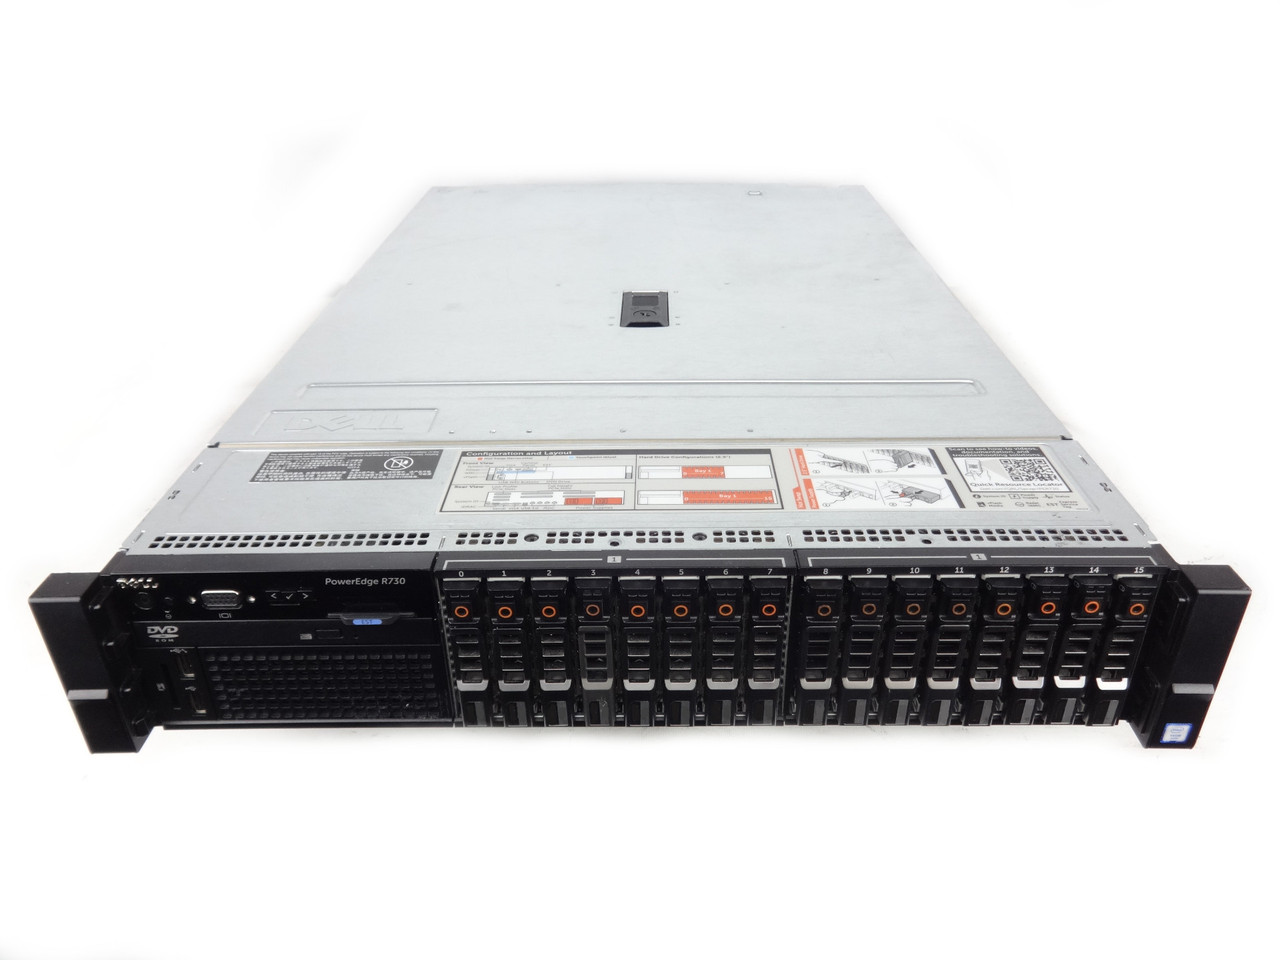 Poweredge R730 16 Bay Server